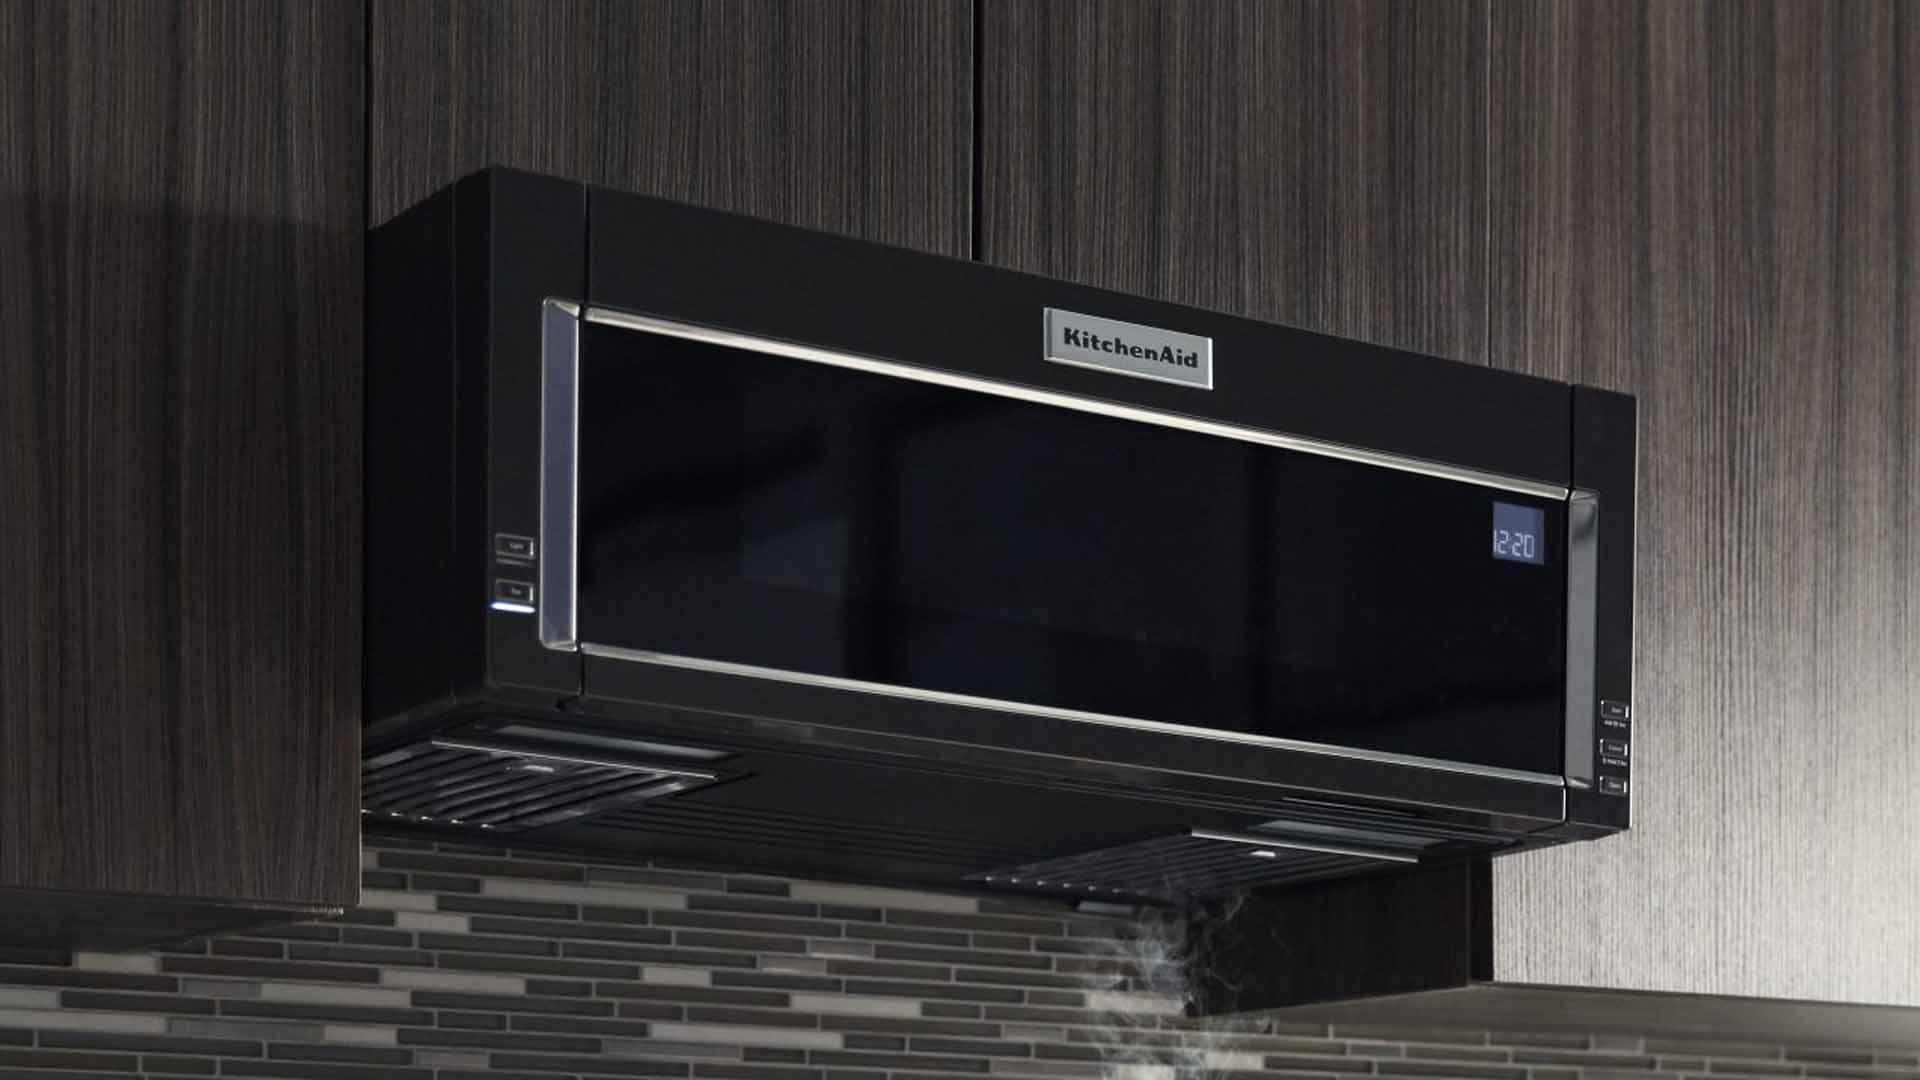 KitchenAid Microwave Repair Service | KitchenAid Repairs